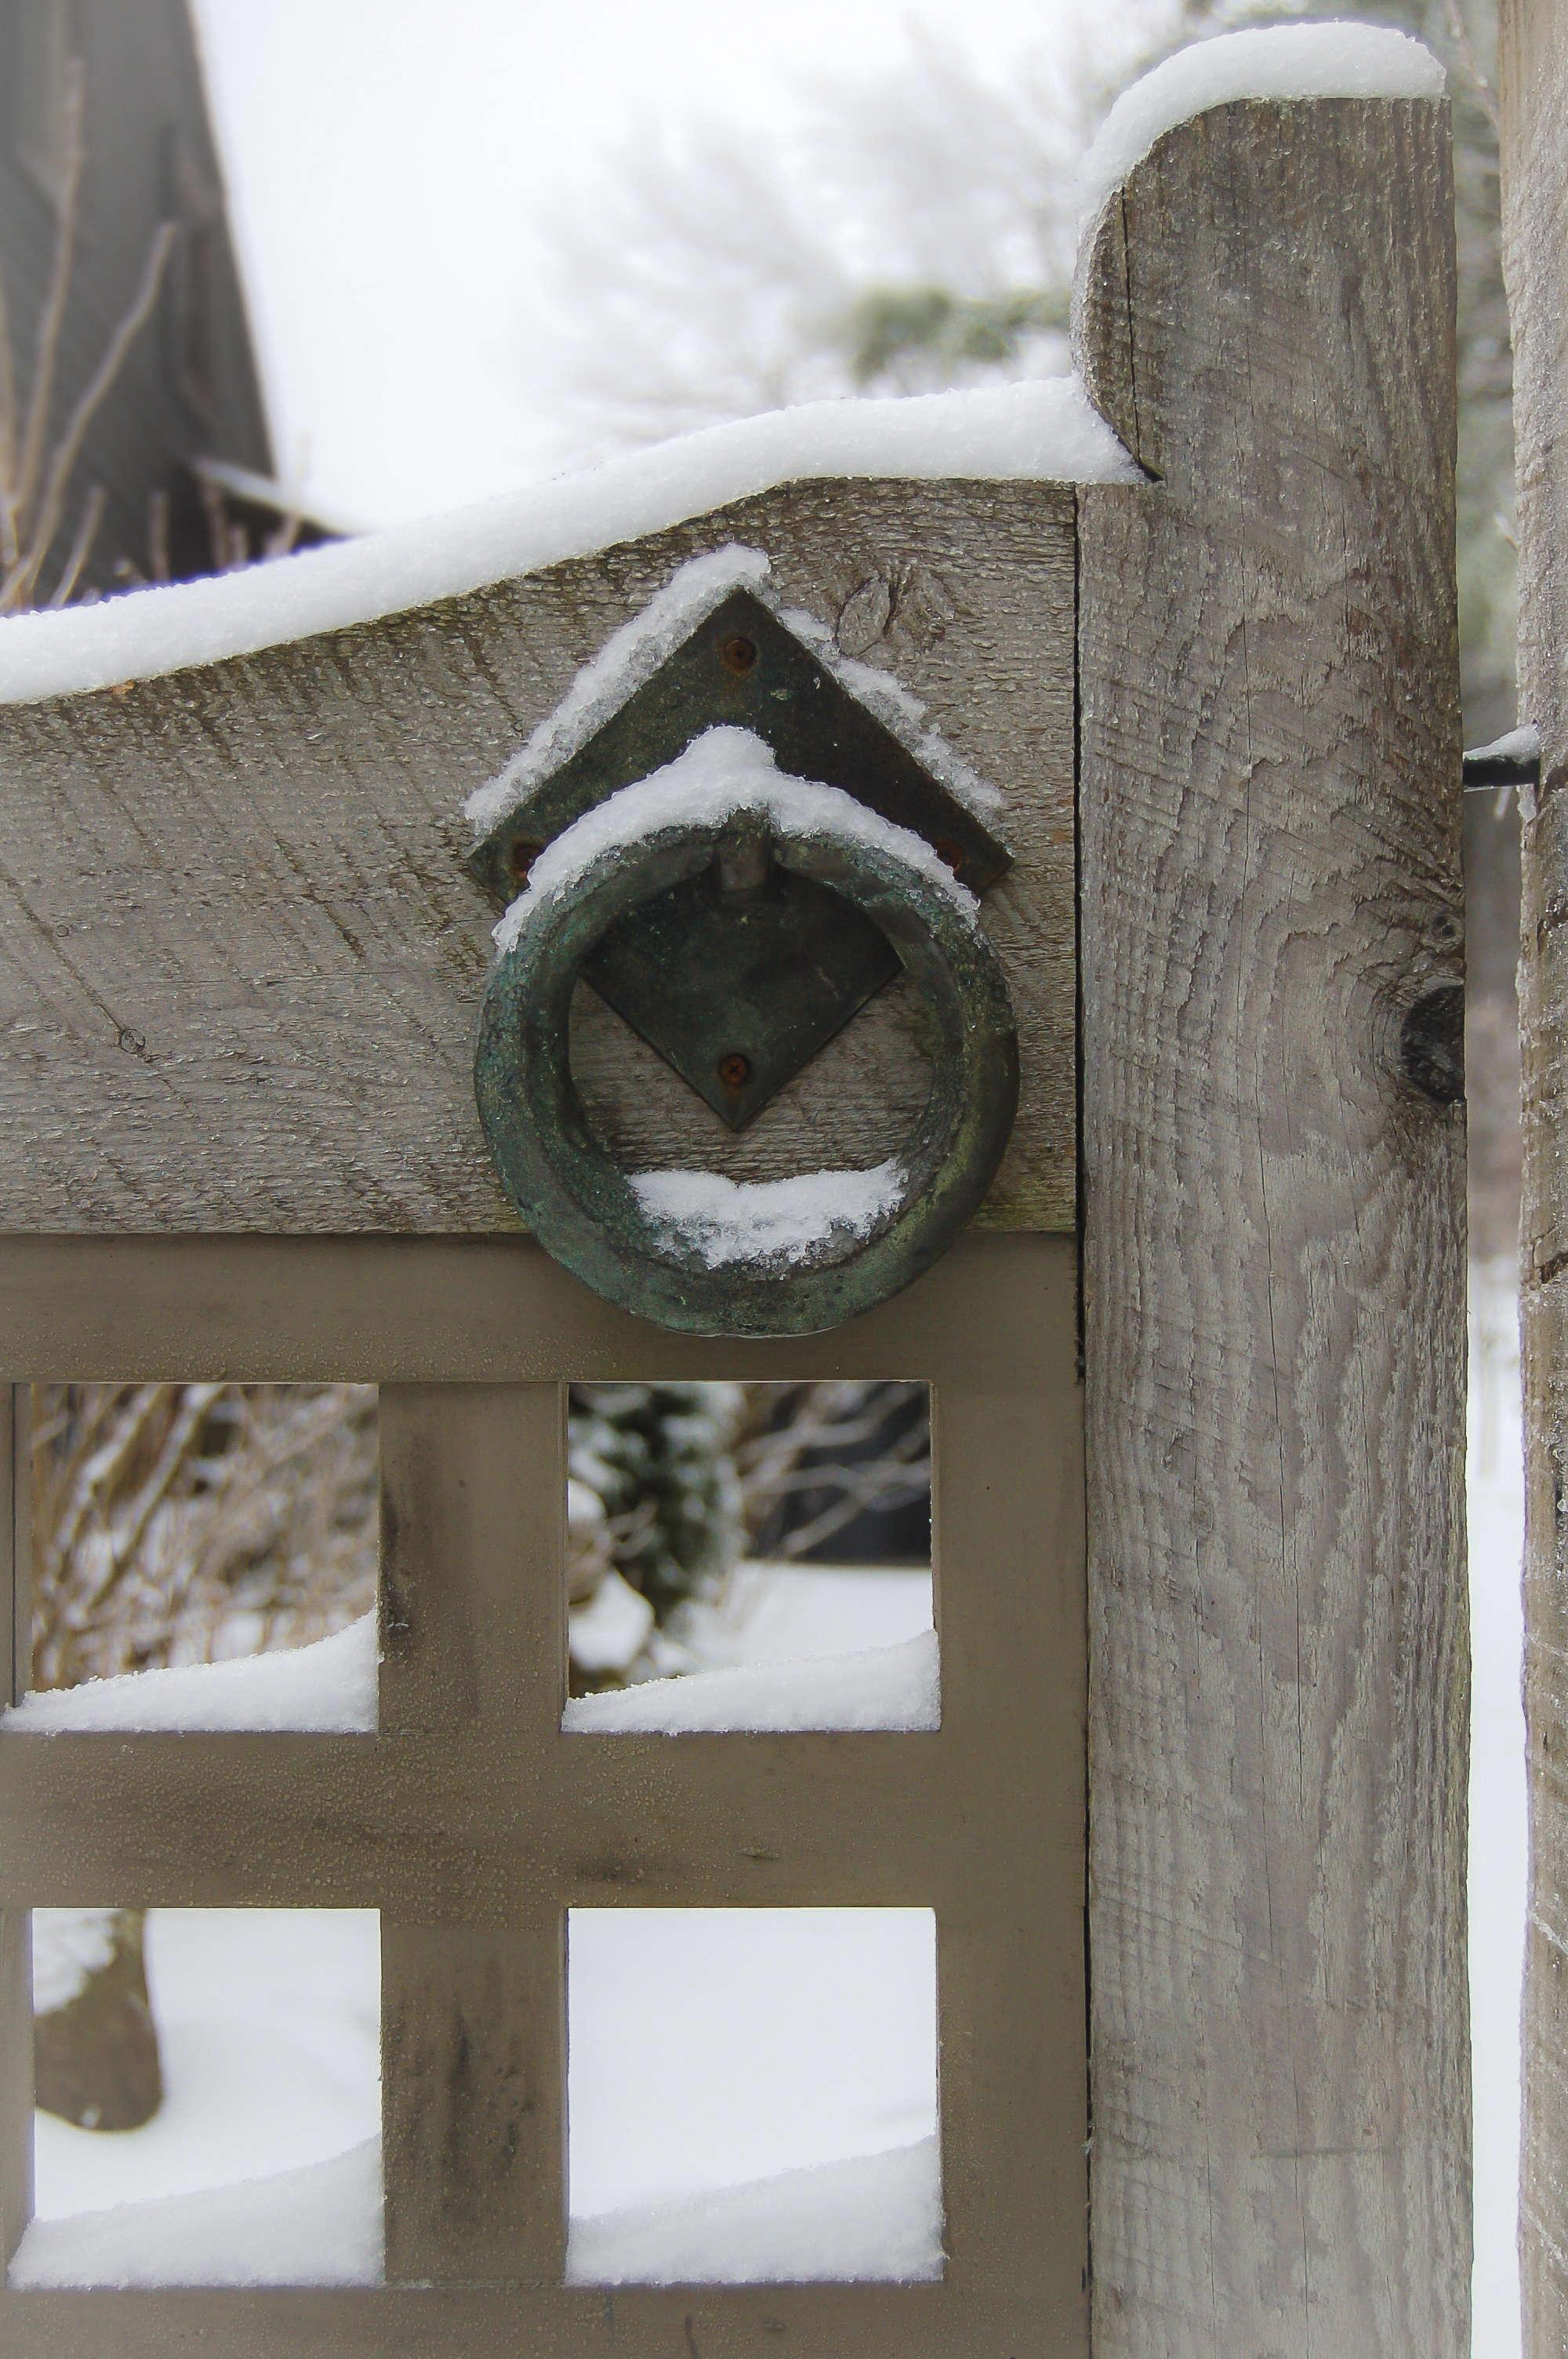 juniper-hill-winter-garden-gate-latch-joseph-valentine-6